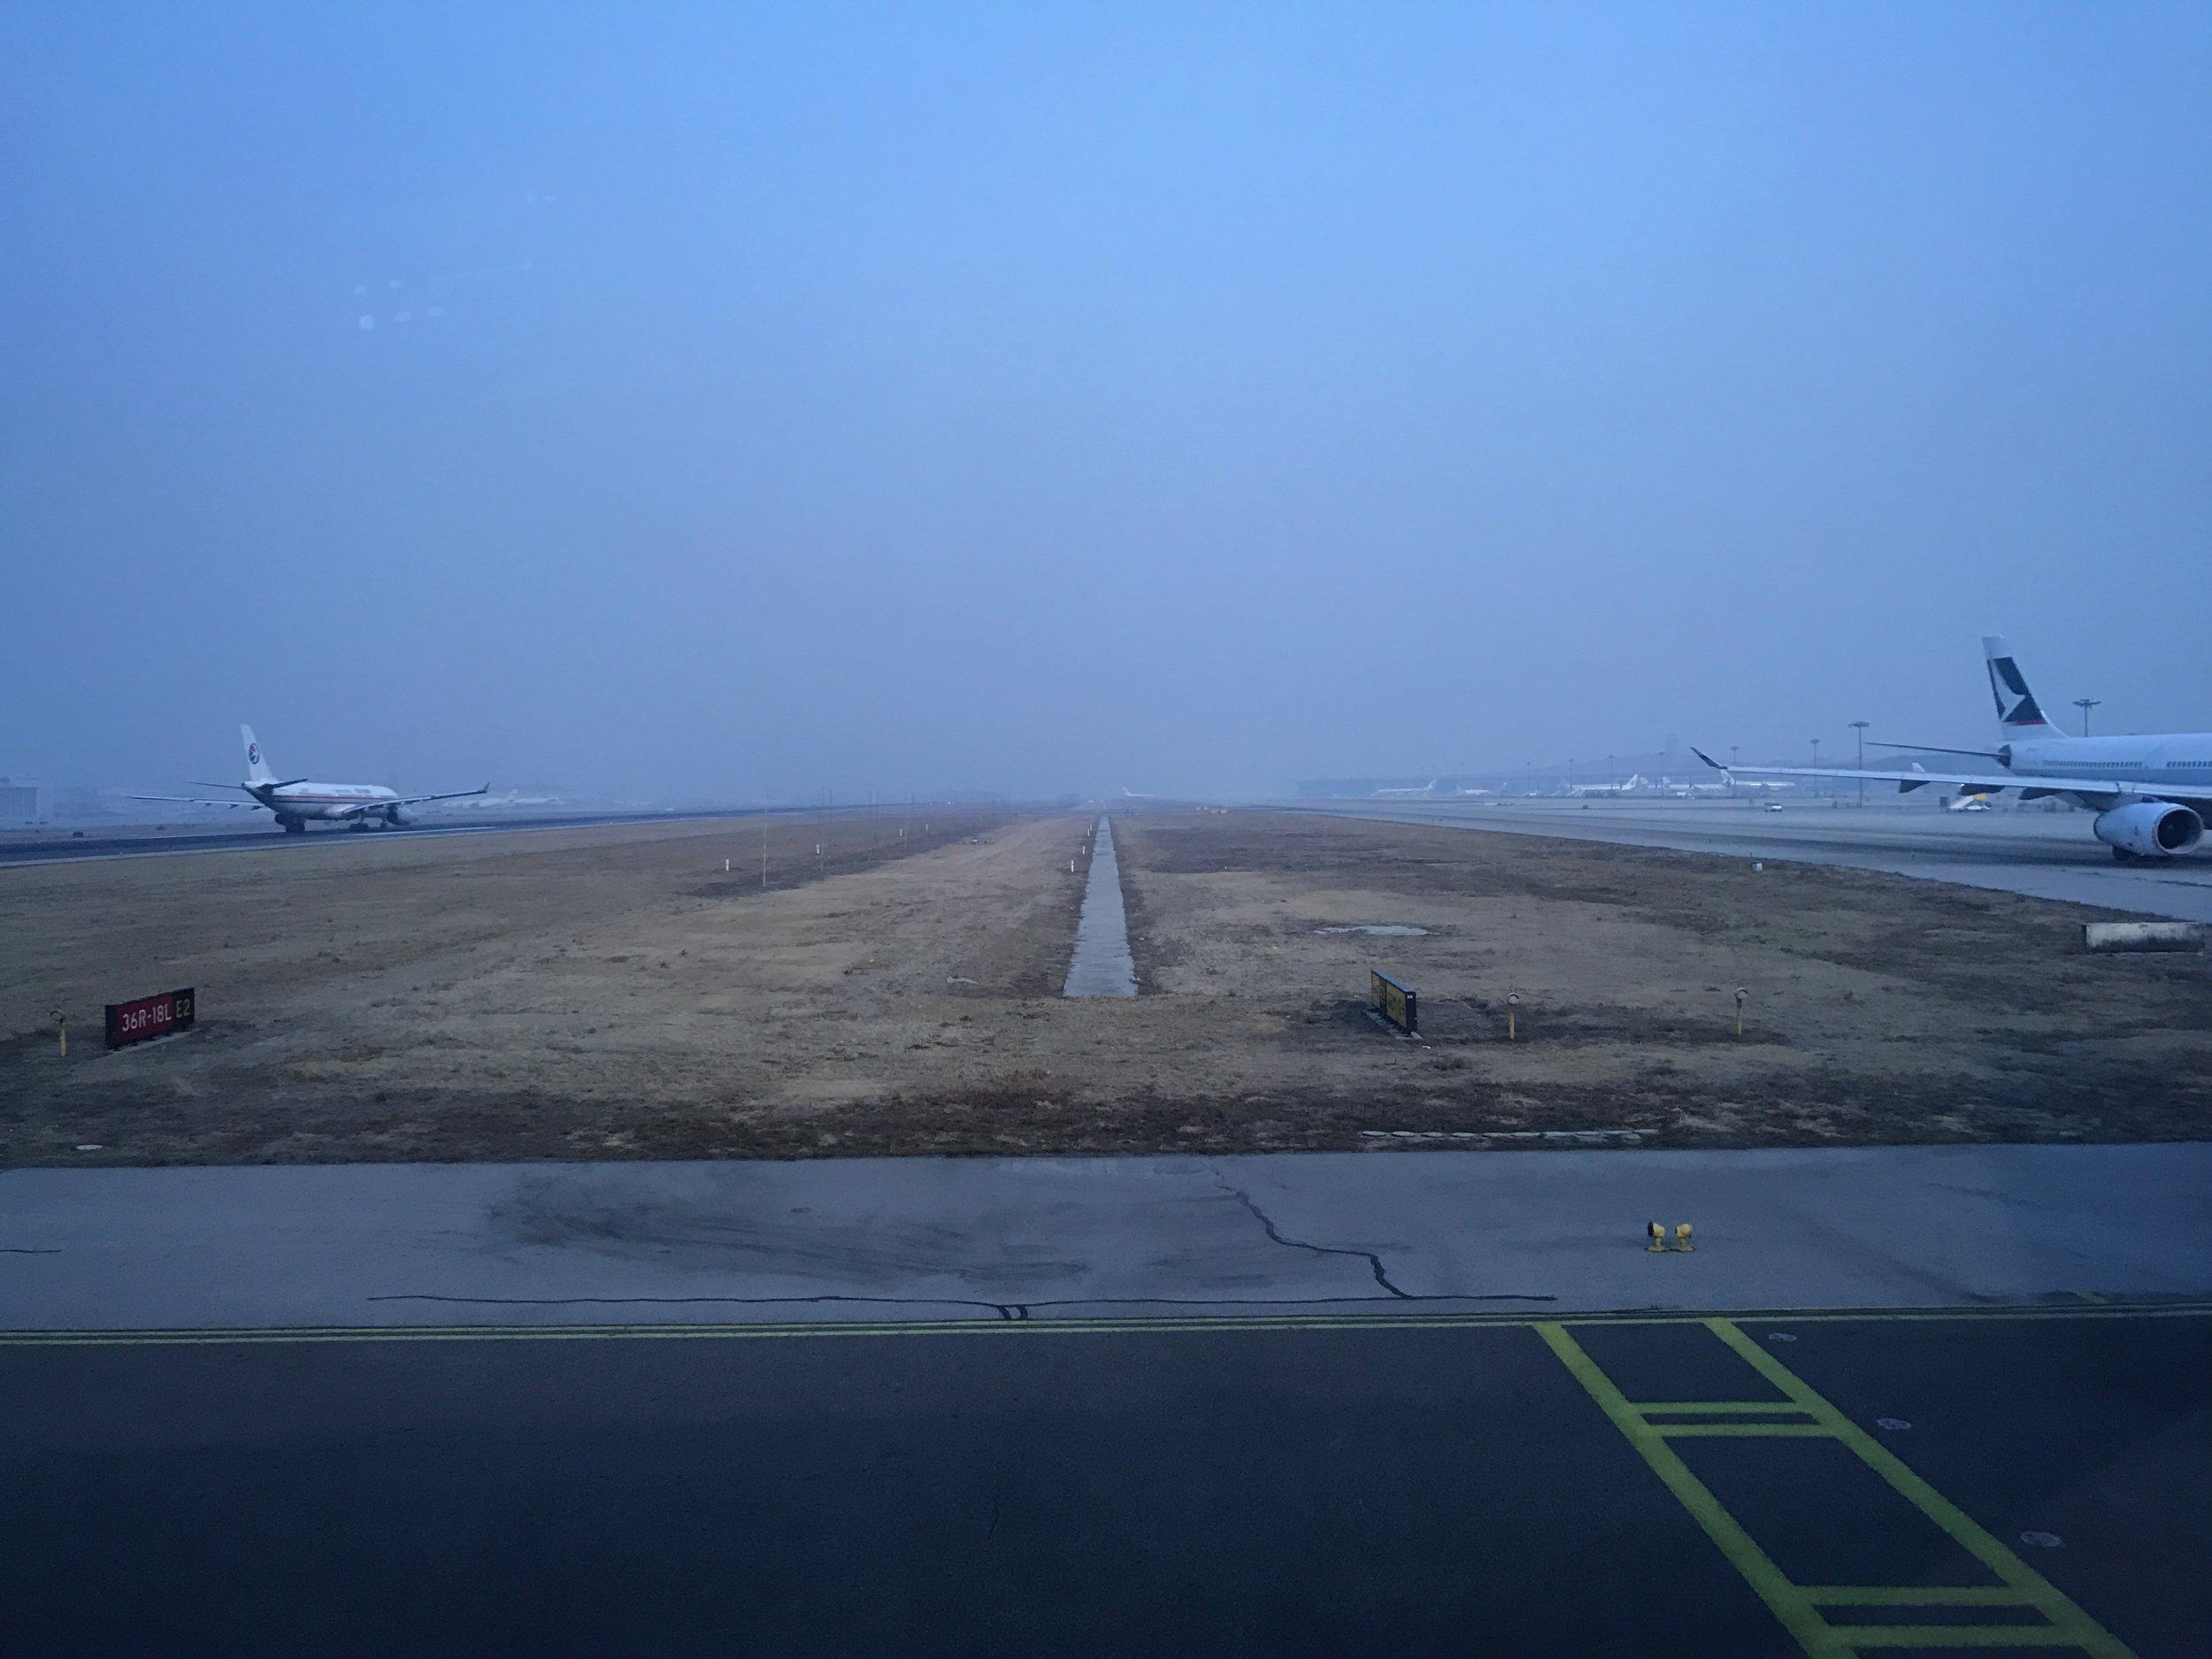 Beijing Airport (PEK) tarmac traffic during taxiing